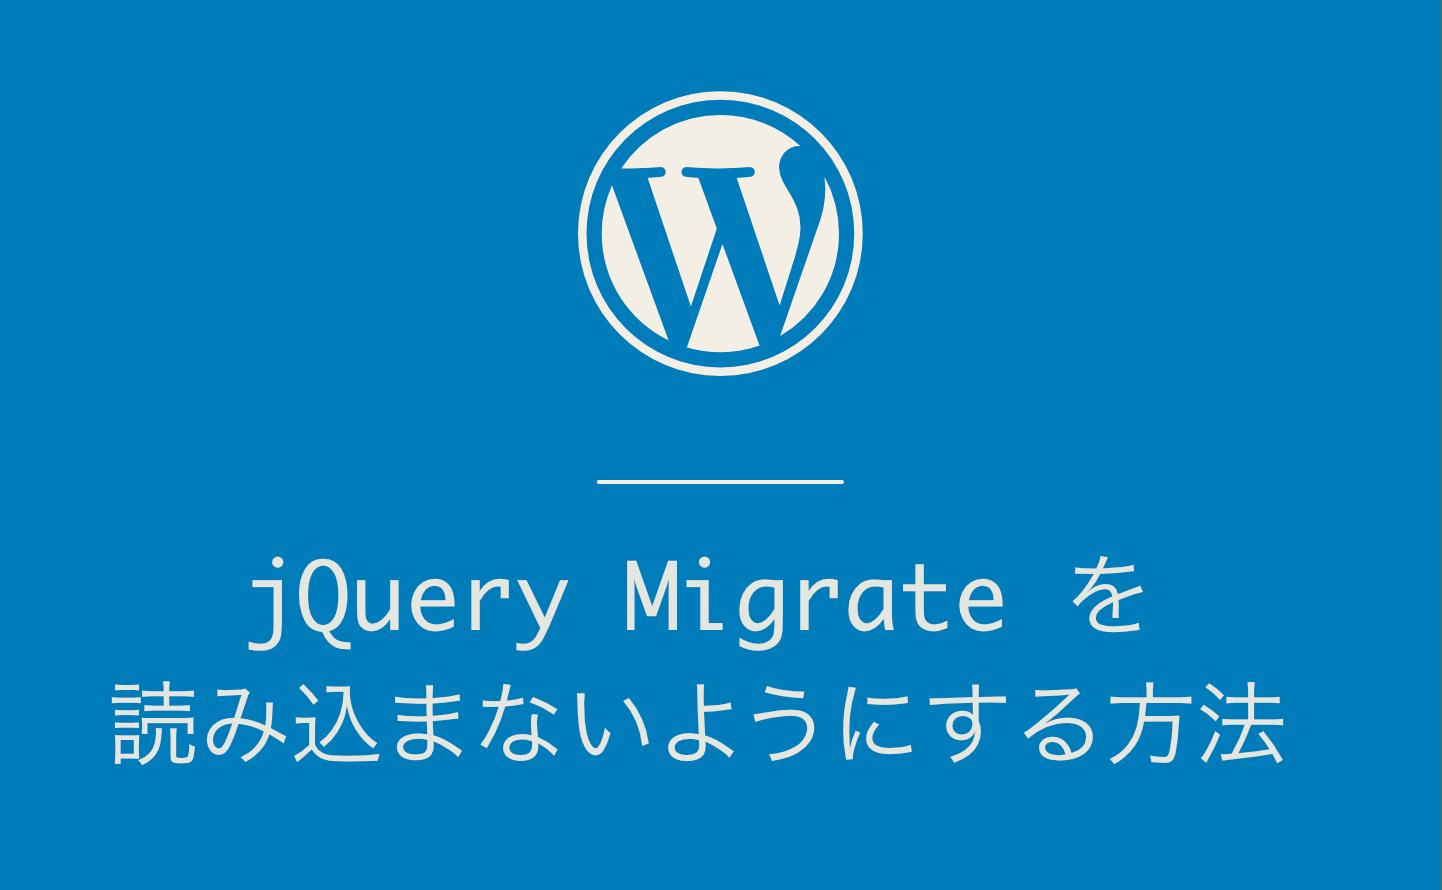 WordPressでjQuery Migrate を読み込まないようにする方法